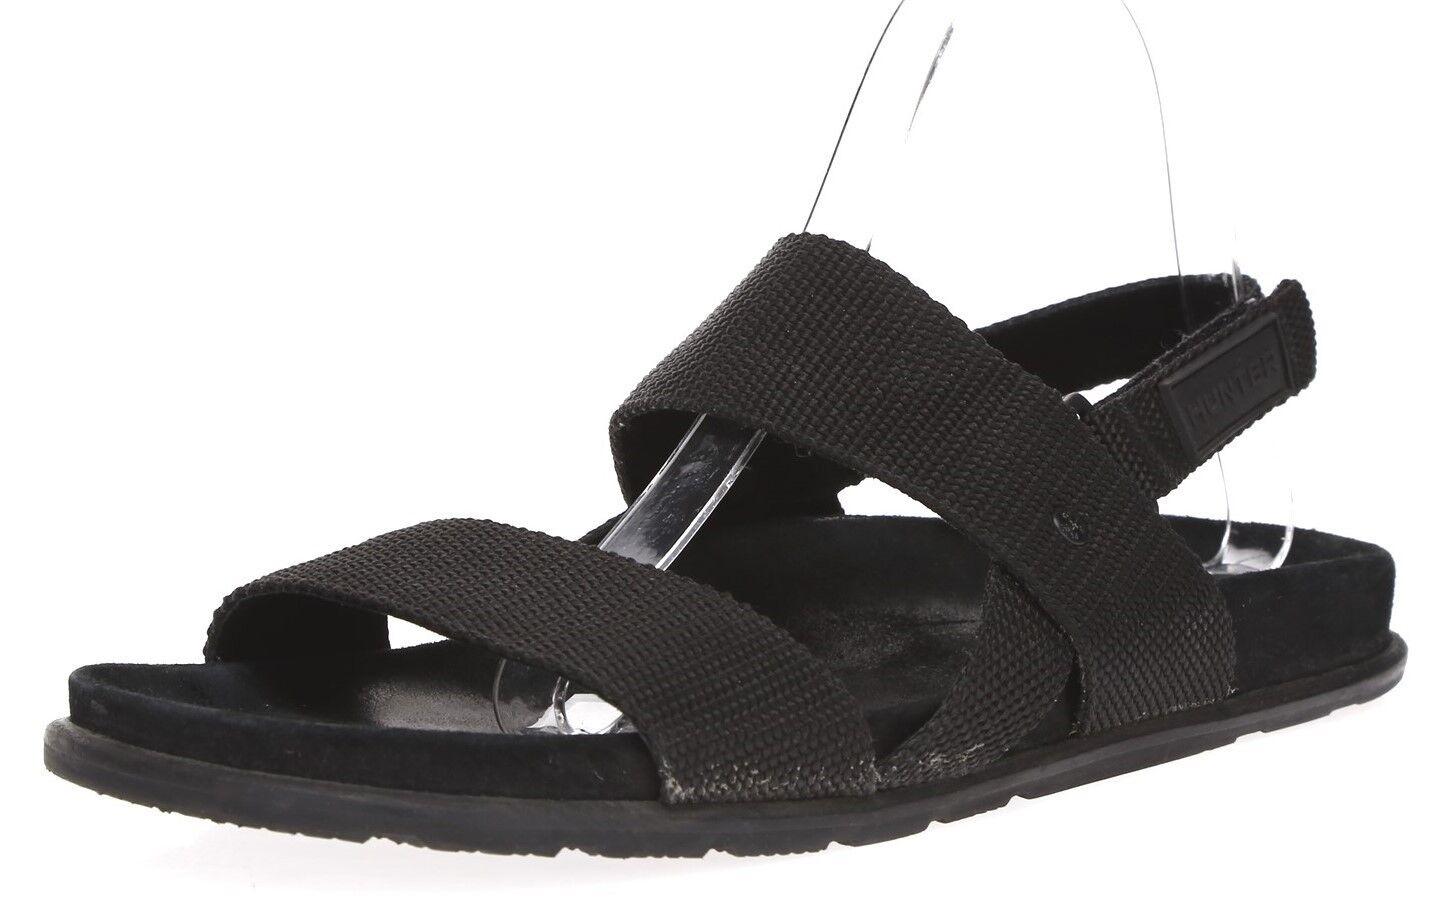 HUNTER Mens Black Double Strap Wedding Sandals Sz Sz Sz 8 M c27904